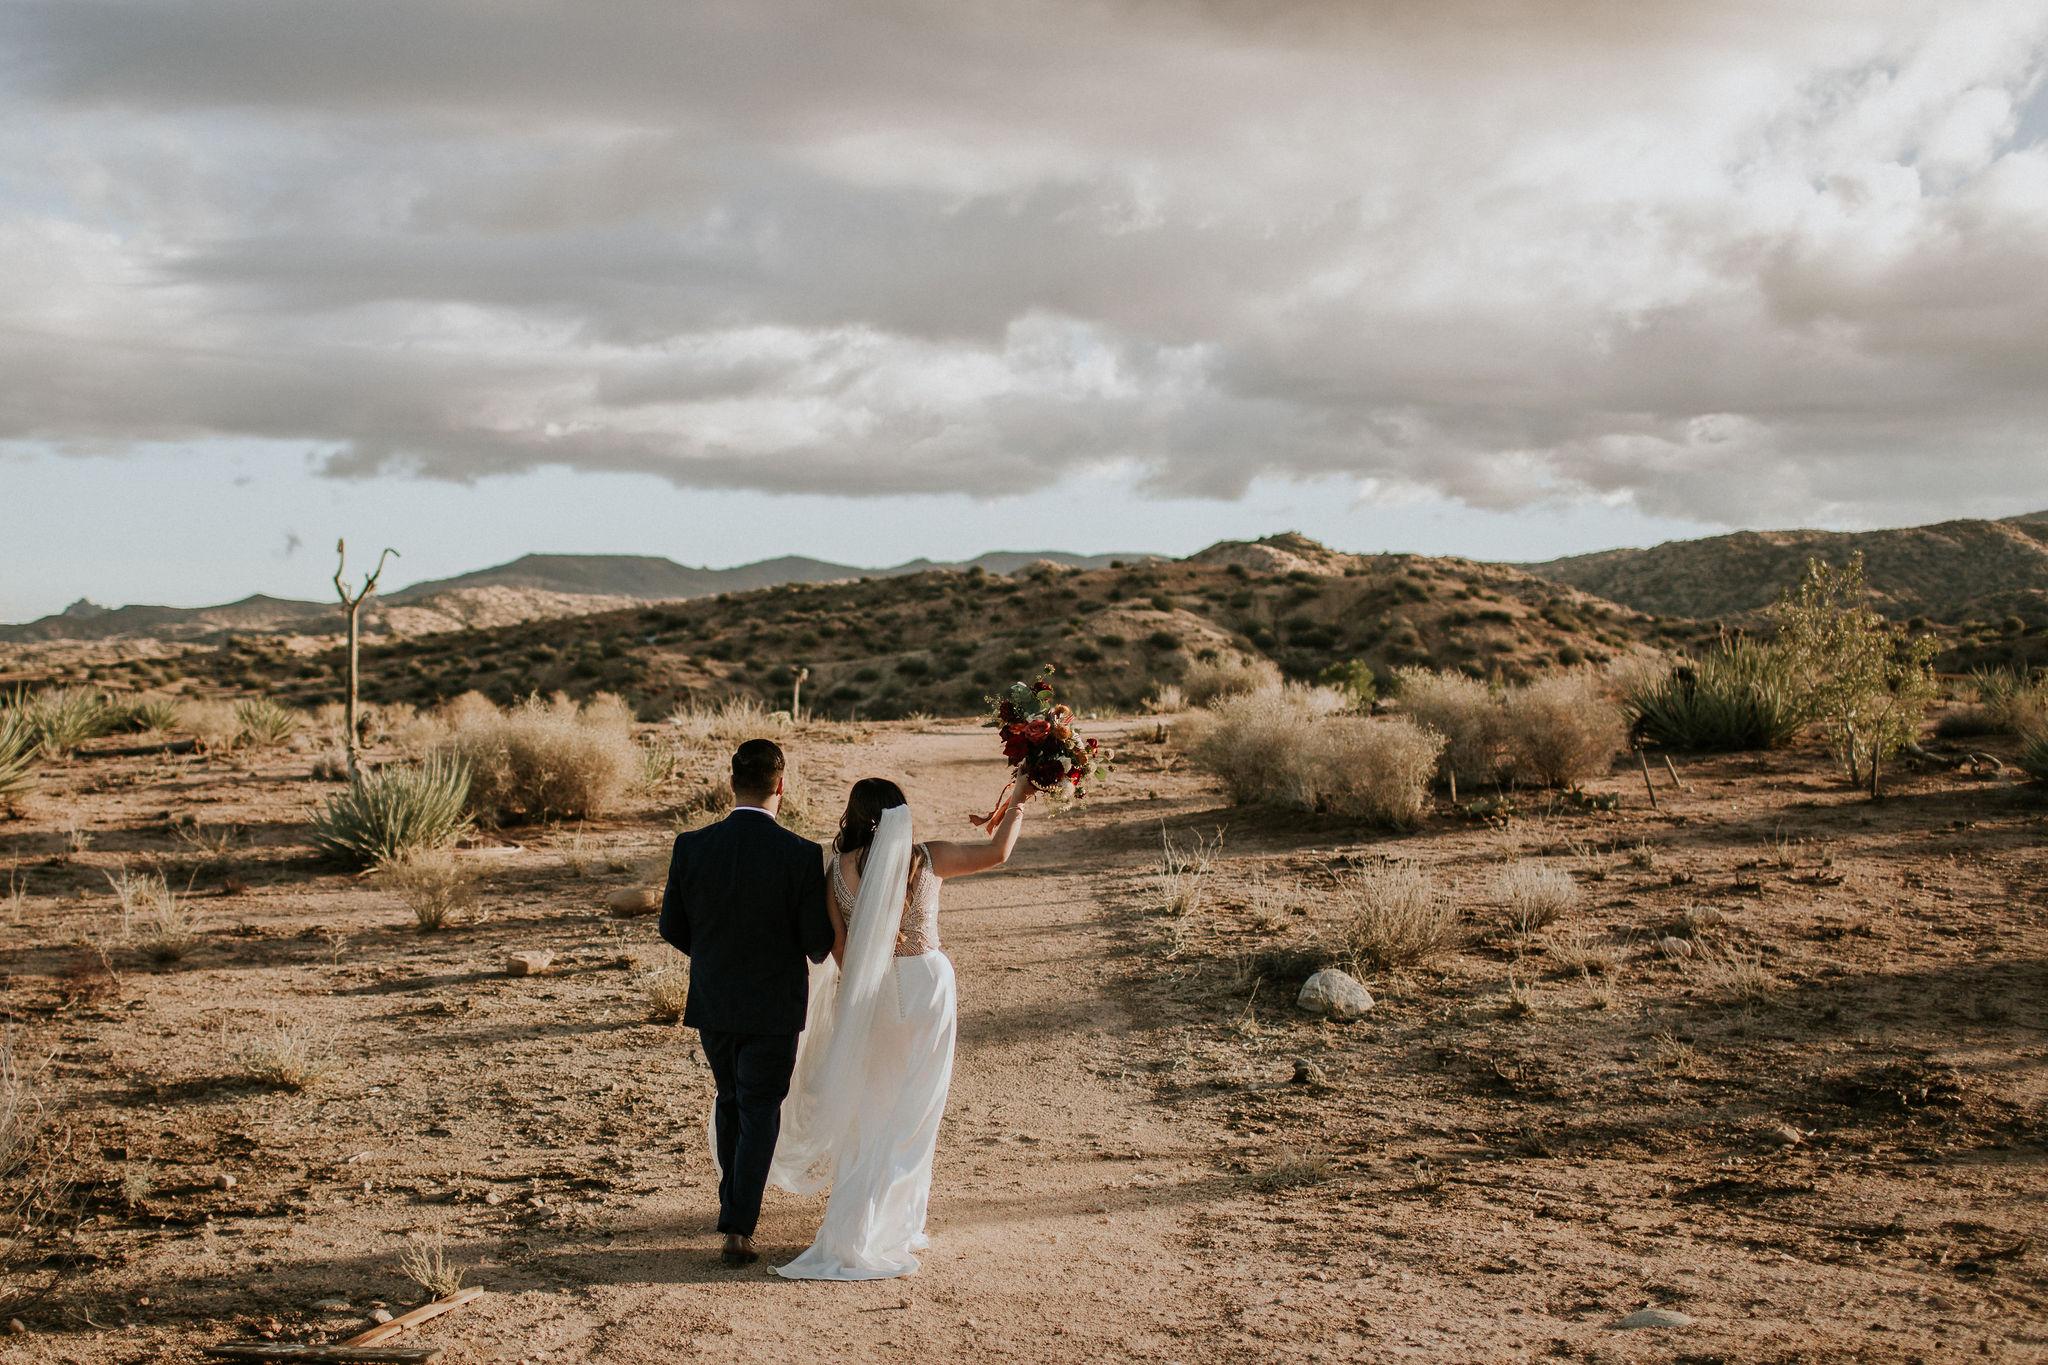 RimrockRanch-JoshuaTree-Wedding-Jami-Laree-603.jpg